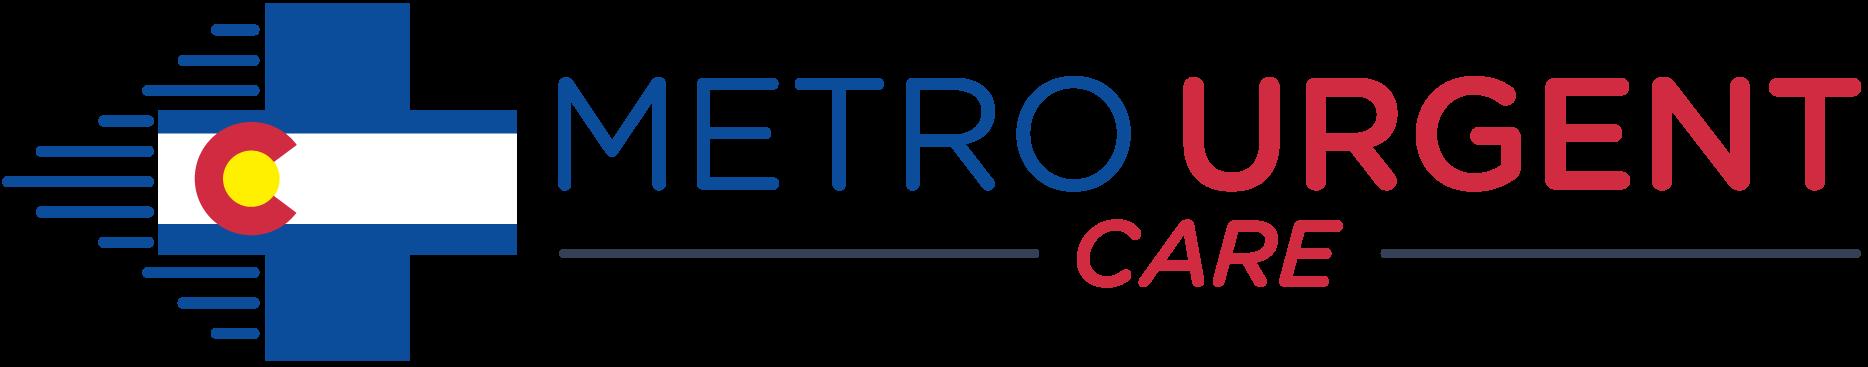 Metro Urgent Care - Lewis Way Logo